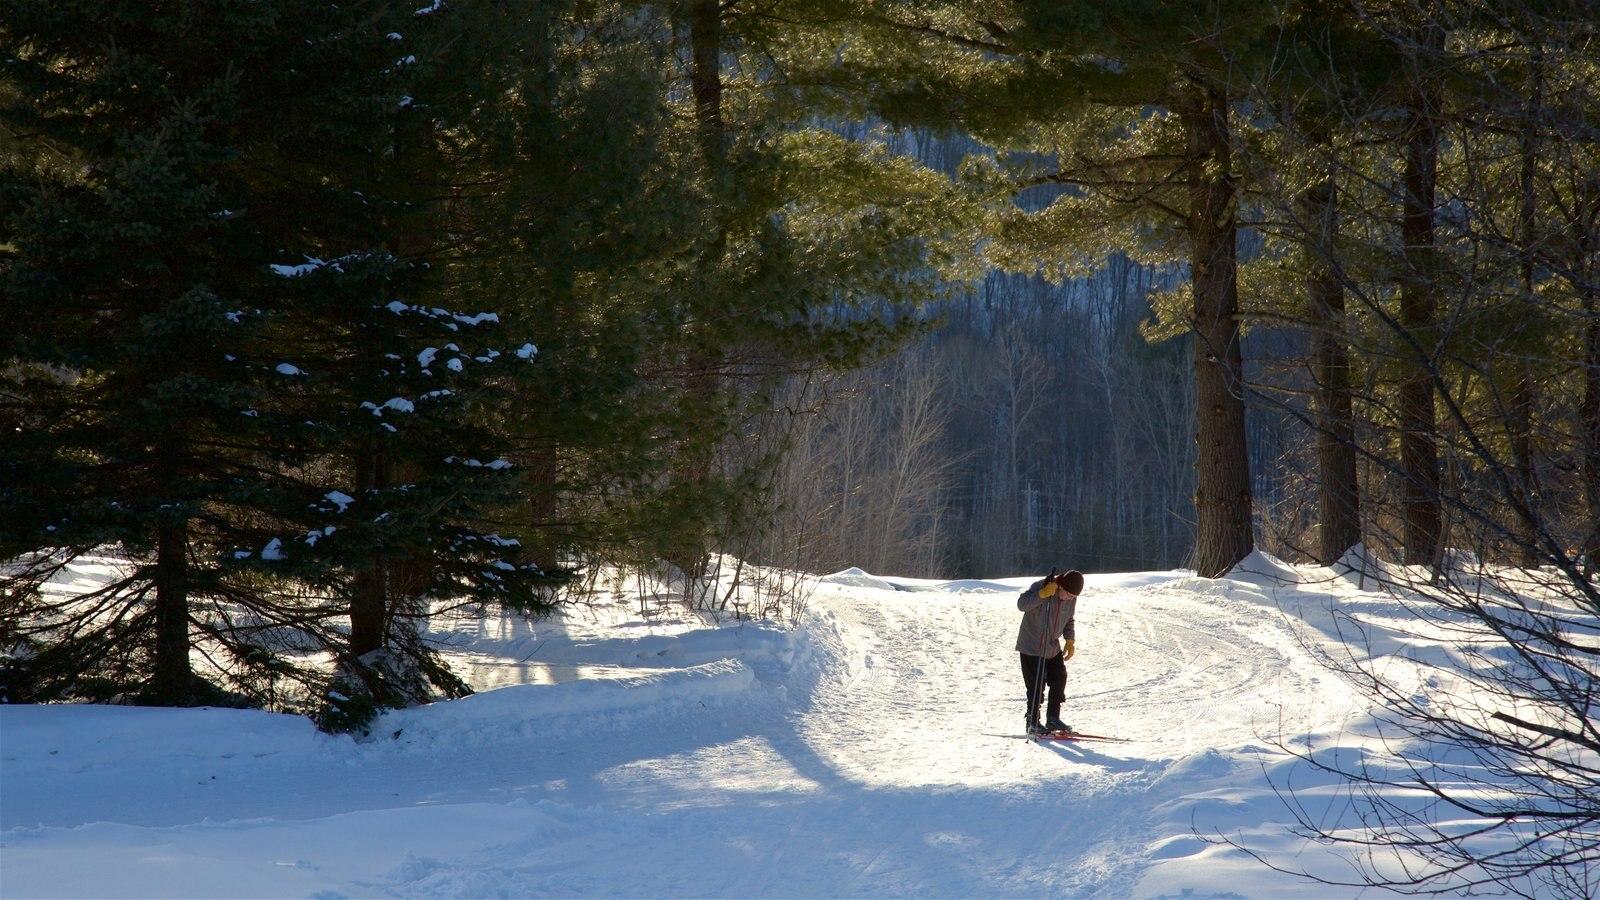 Ottawa caracterizando florestas, esqui na neve e neve